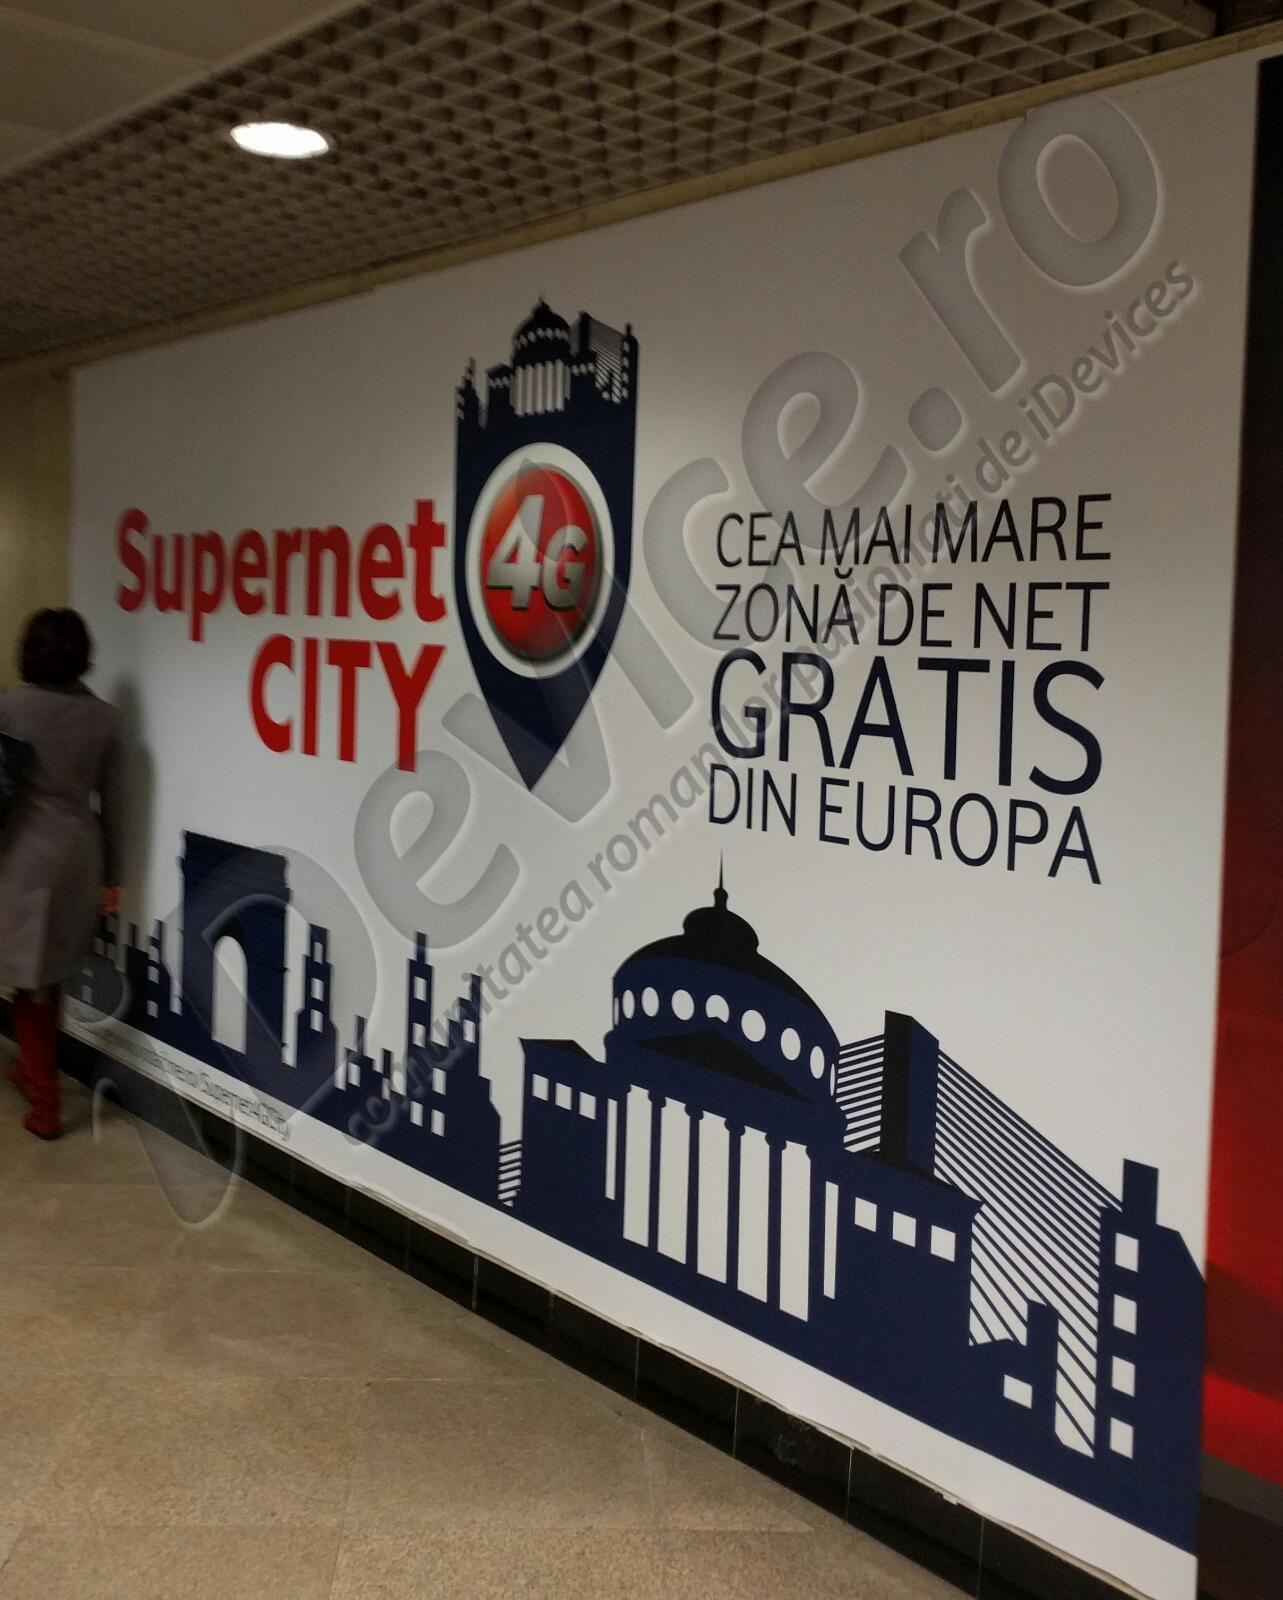 Vodafone Supernet 4G City